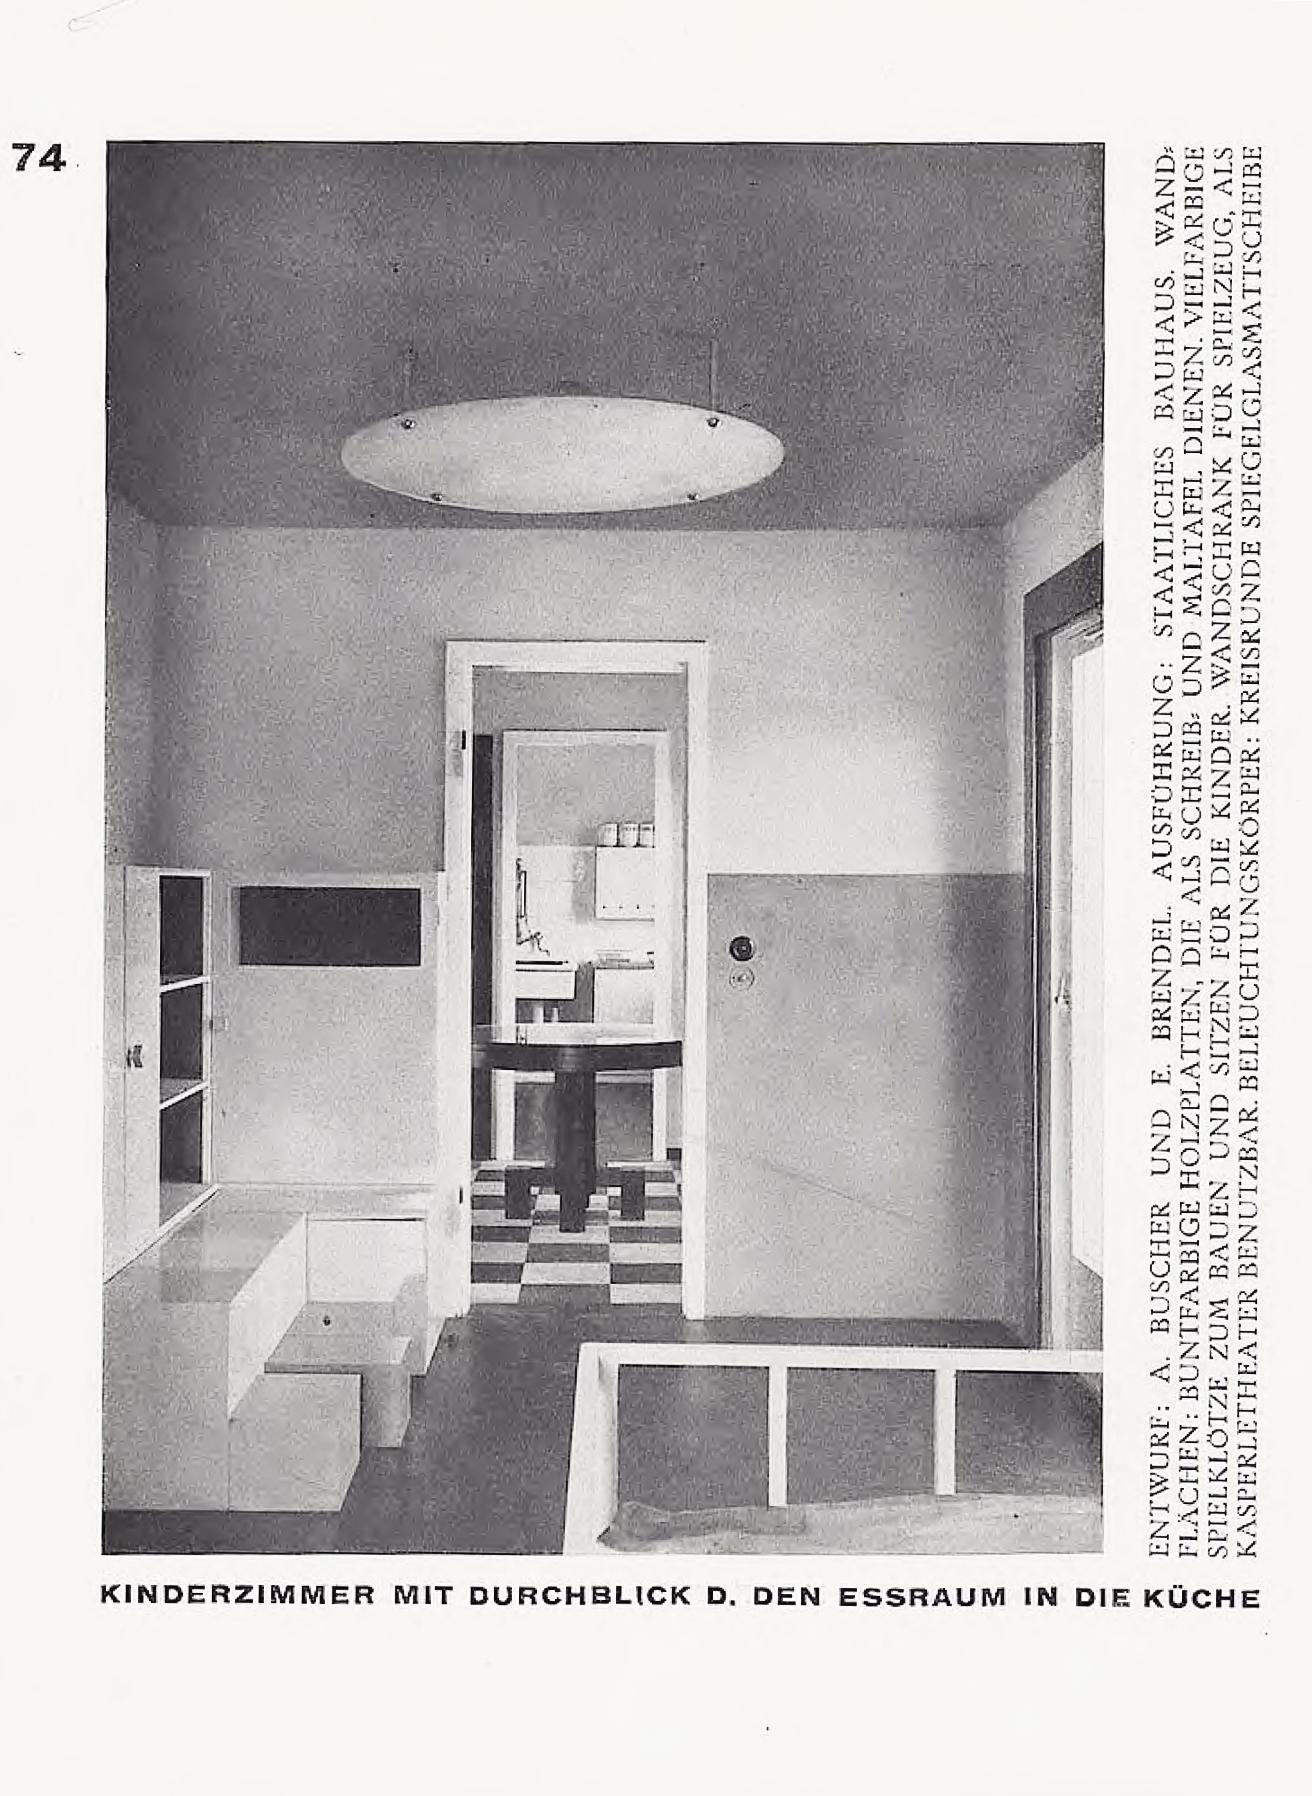 Full Size of Heizkörper Bauhaus Bauhausbuch 03 Meyer Das Versuchshaus Bad Fenster Wohnzimmer Elektroheizkörper Für Badezimmer Wohnzimmer Heizkörper Bauhaus